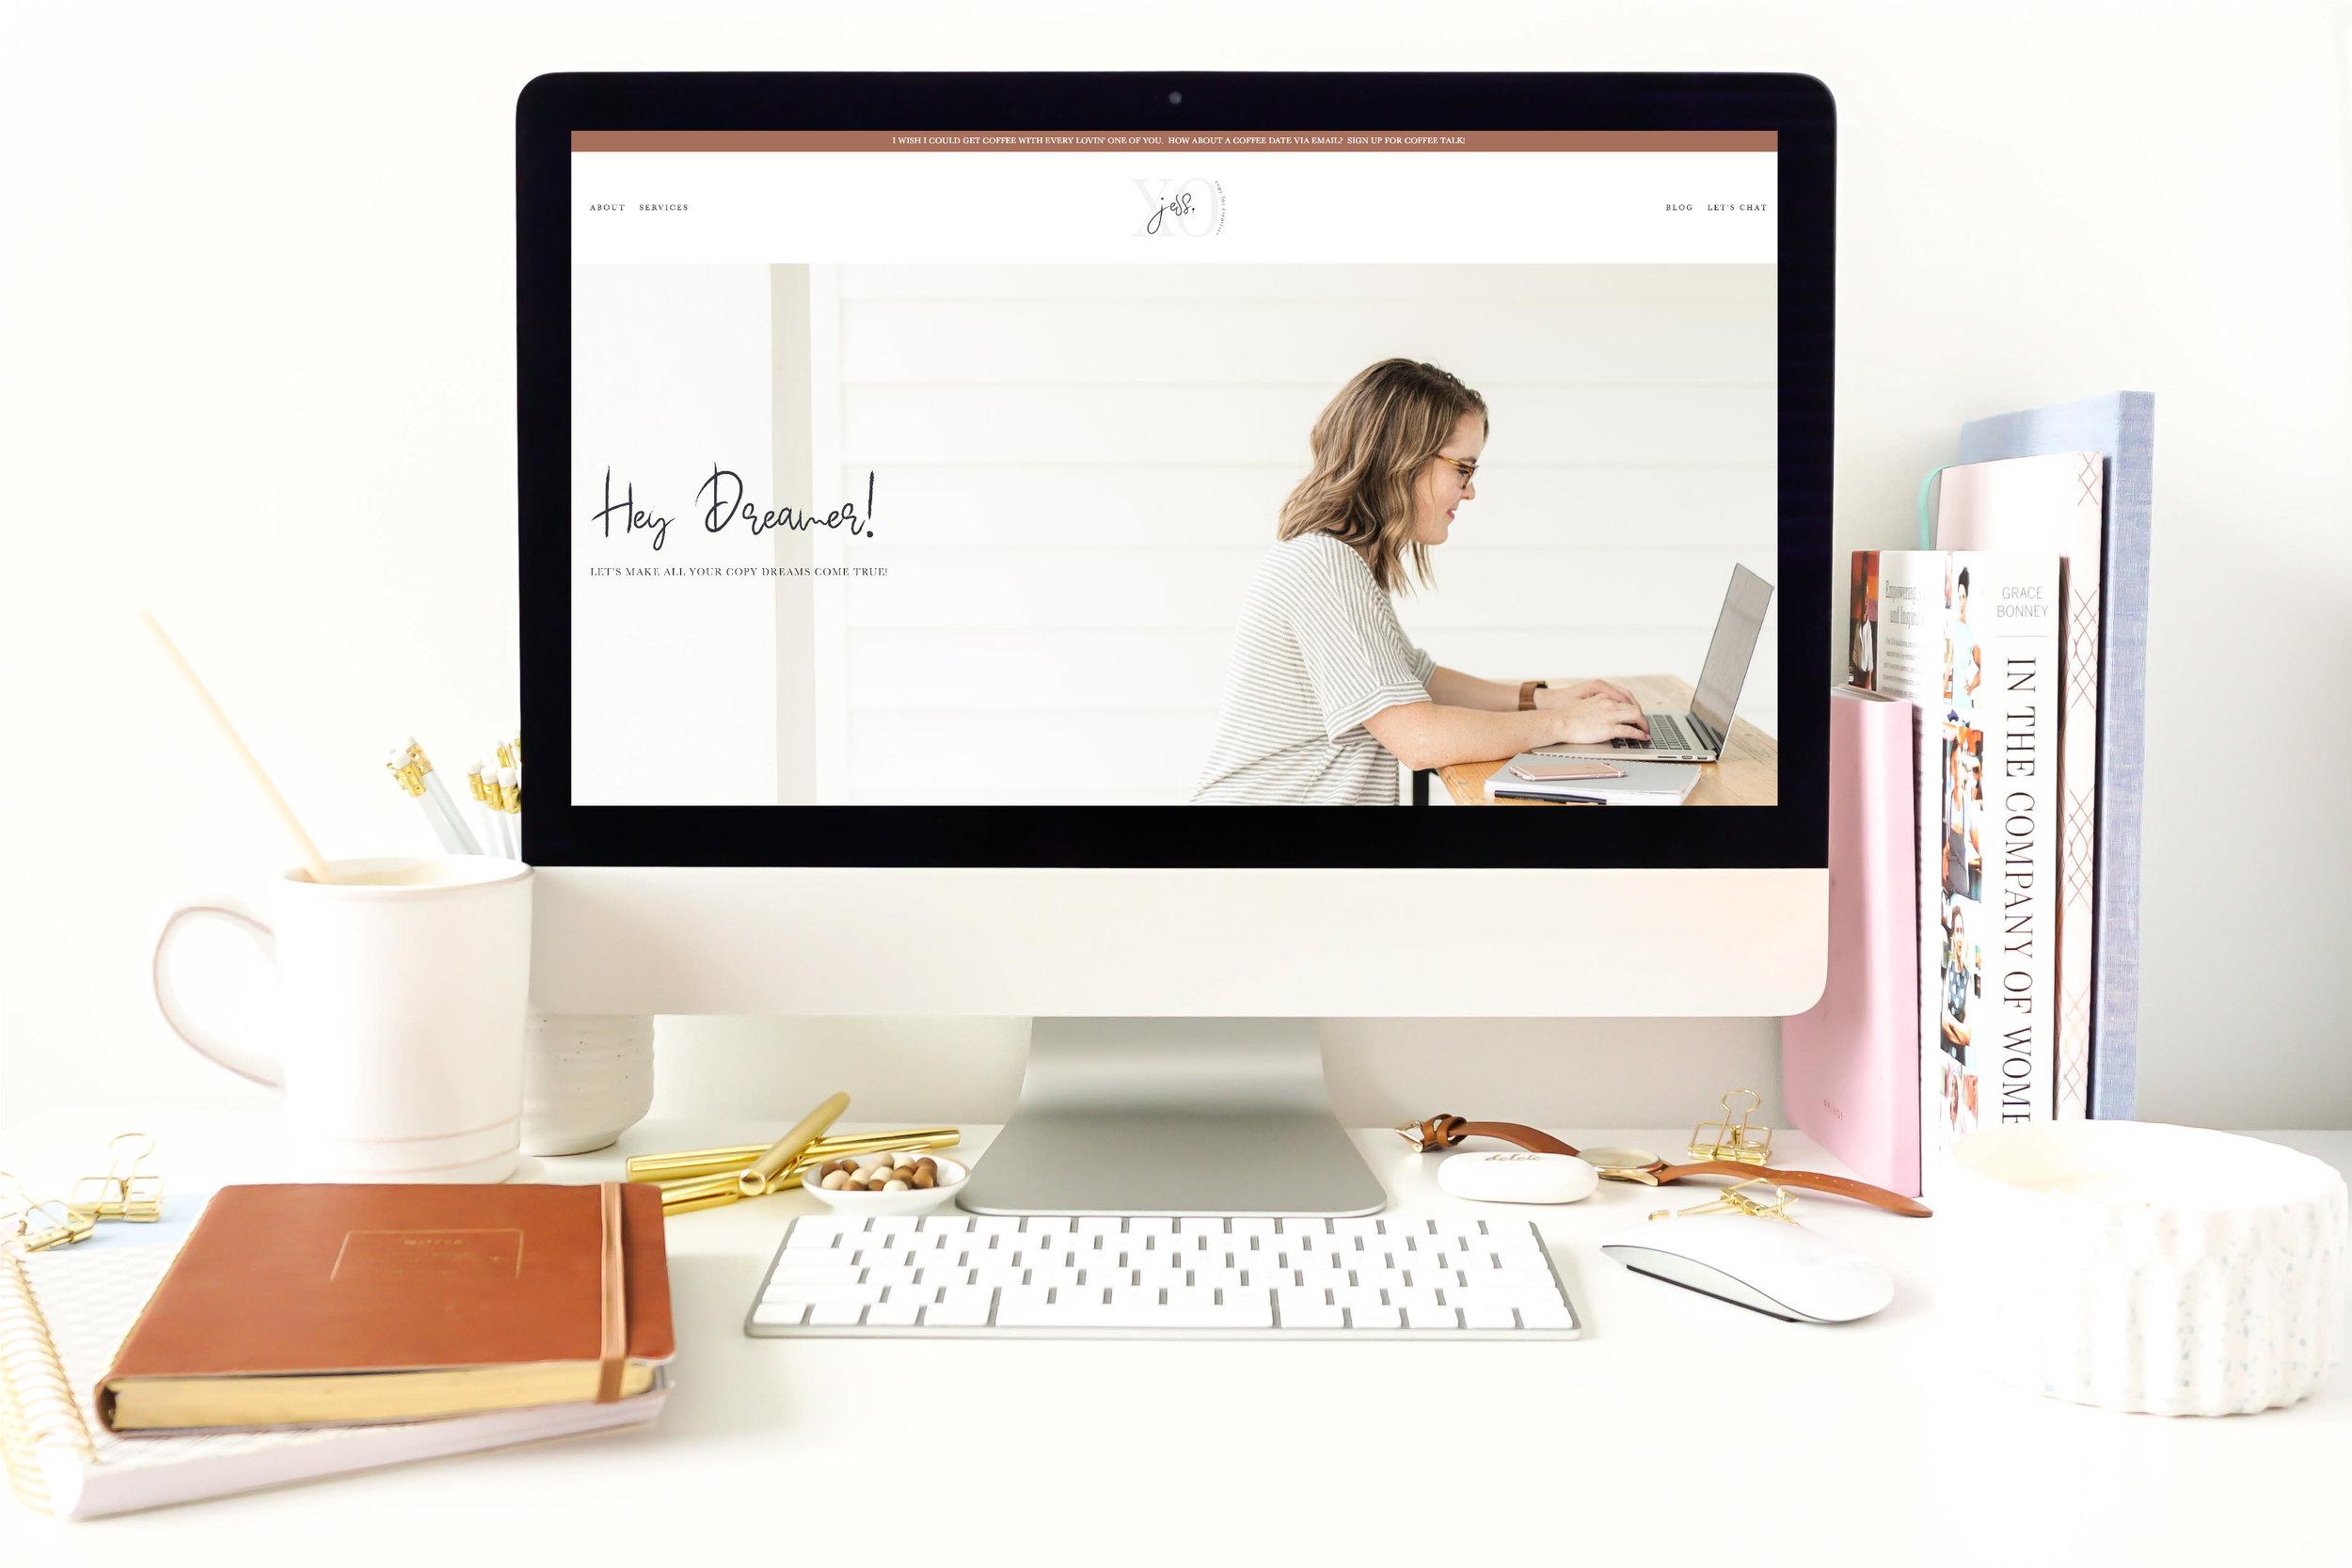 kristen-fulchi-design-studio-branding-photography-web-design-for-creatives-small-businesses-miami-florida-brand-project-jess-xo5.jpg